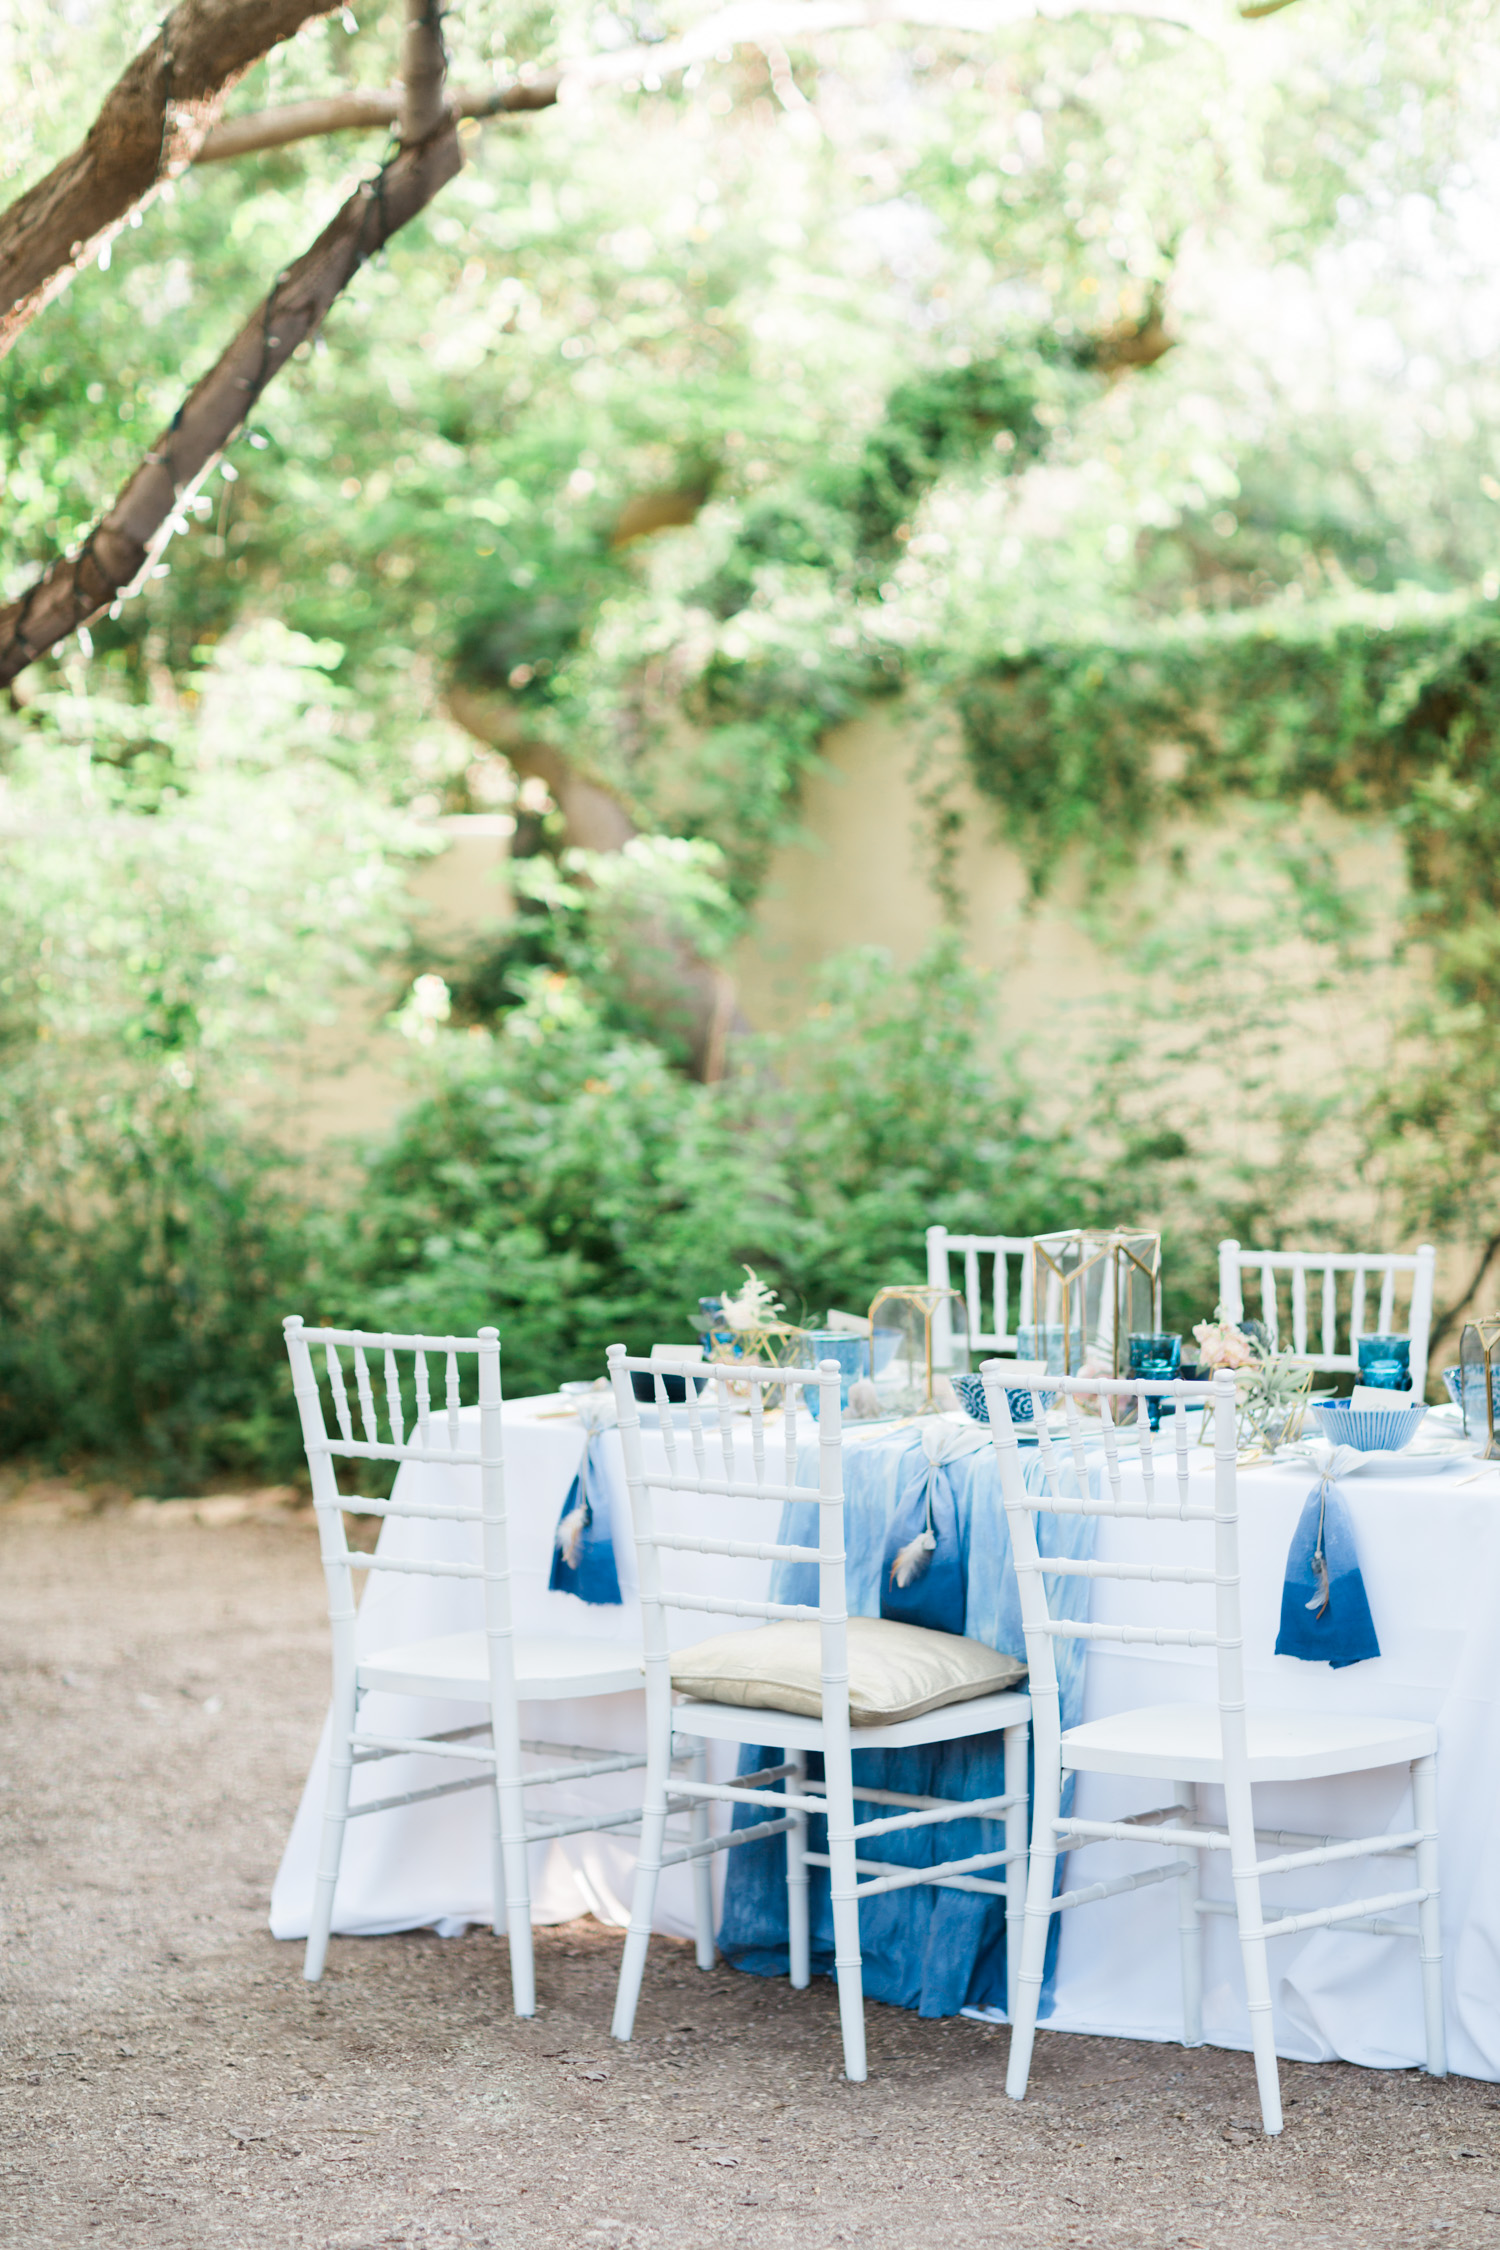 Indigo bohemian wedding at Tohono Chul Gardens by Tucson Wedding photographers Betsy & John